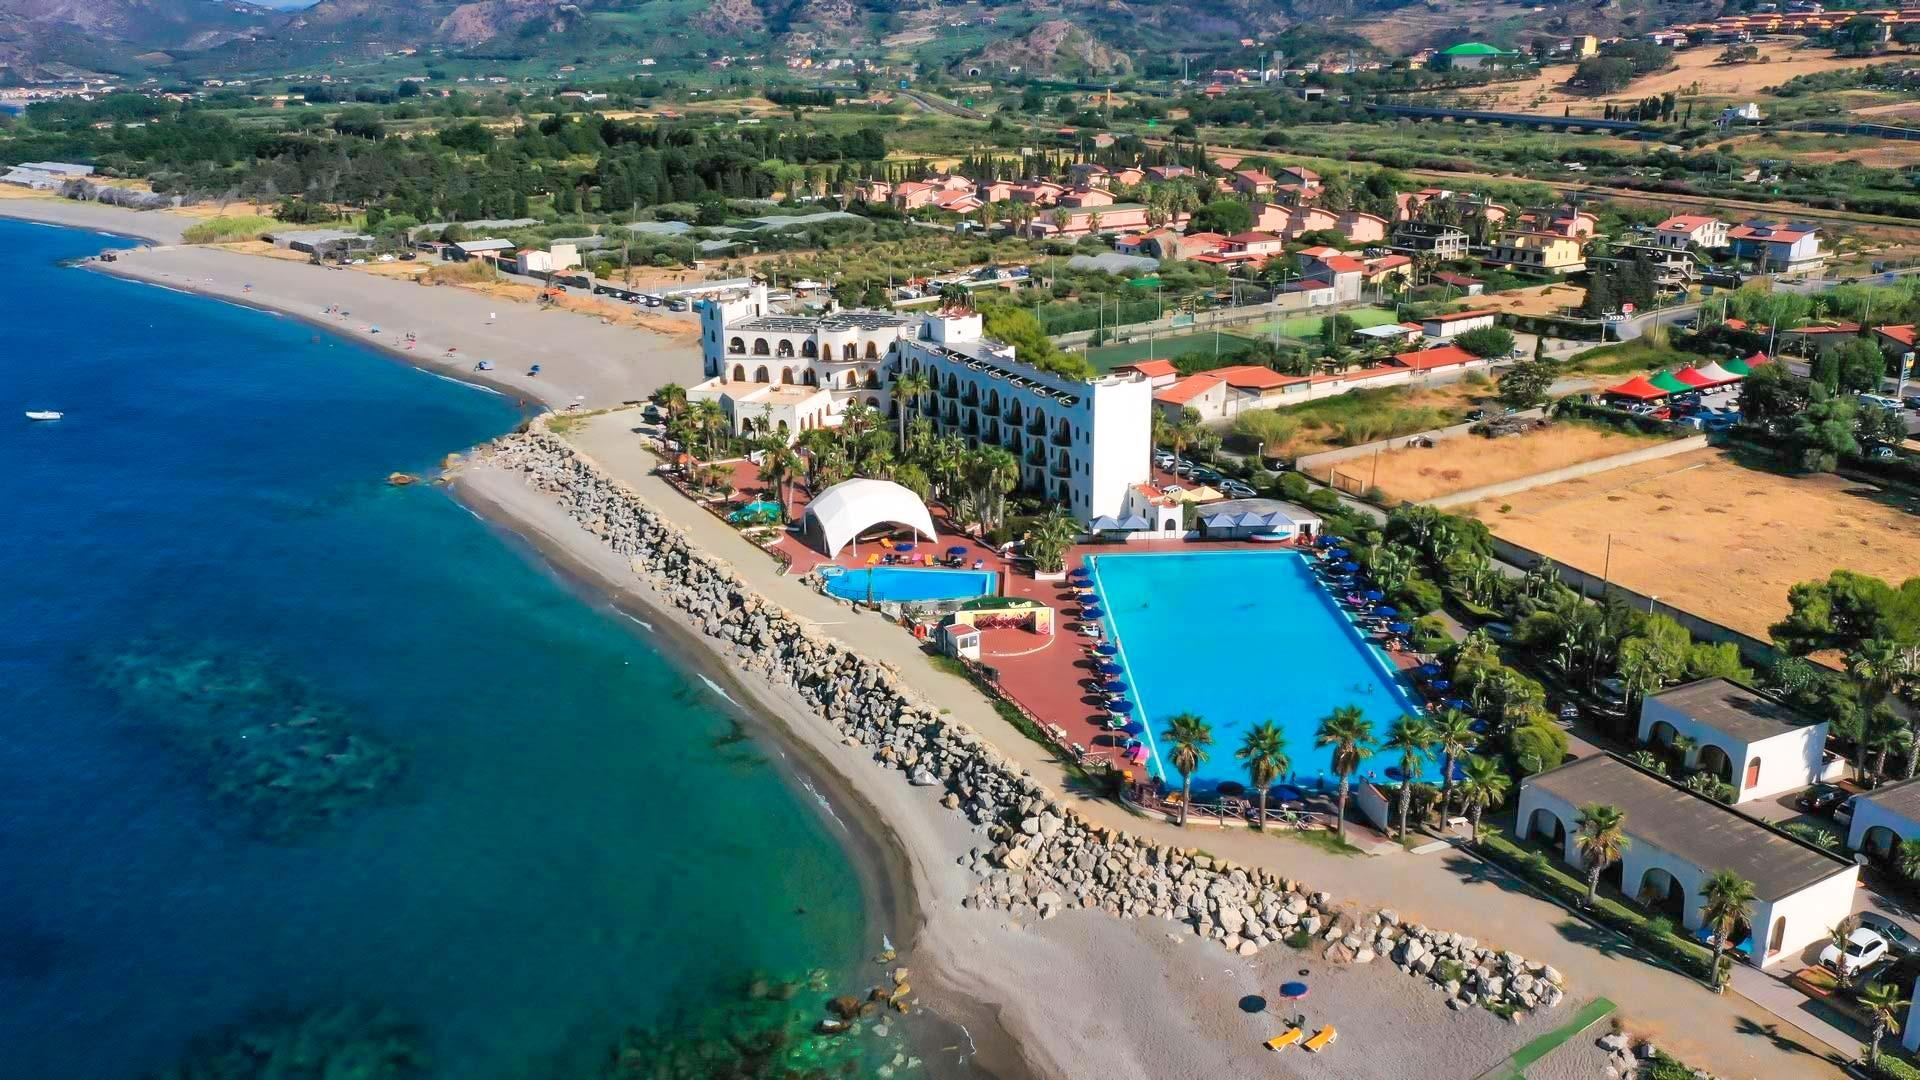 Hotel Club La Playa, Messina - Sicilia